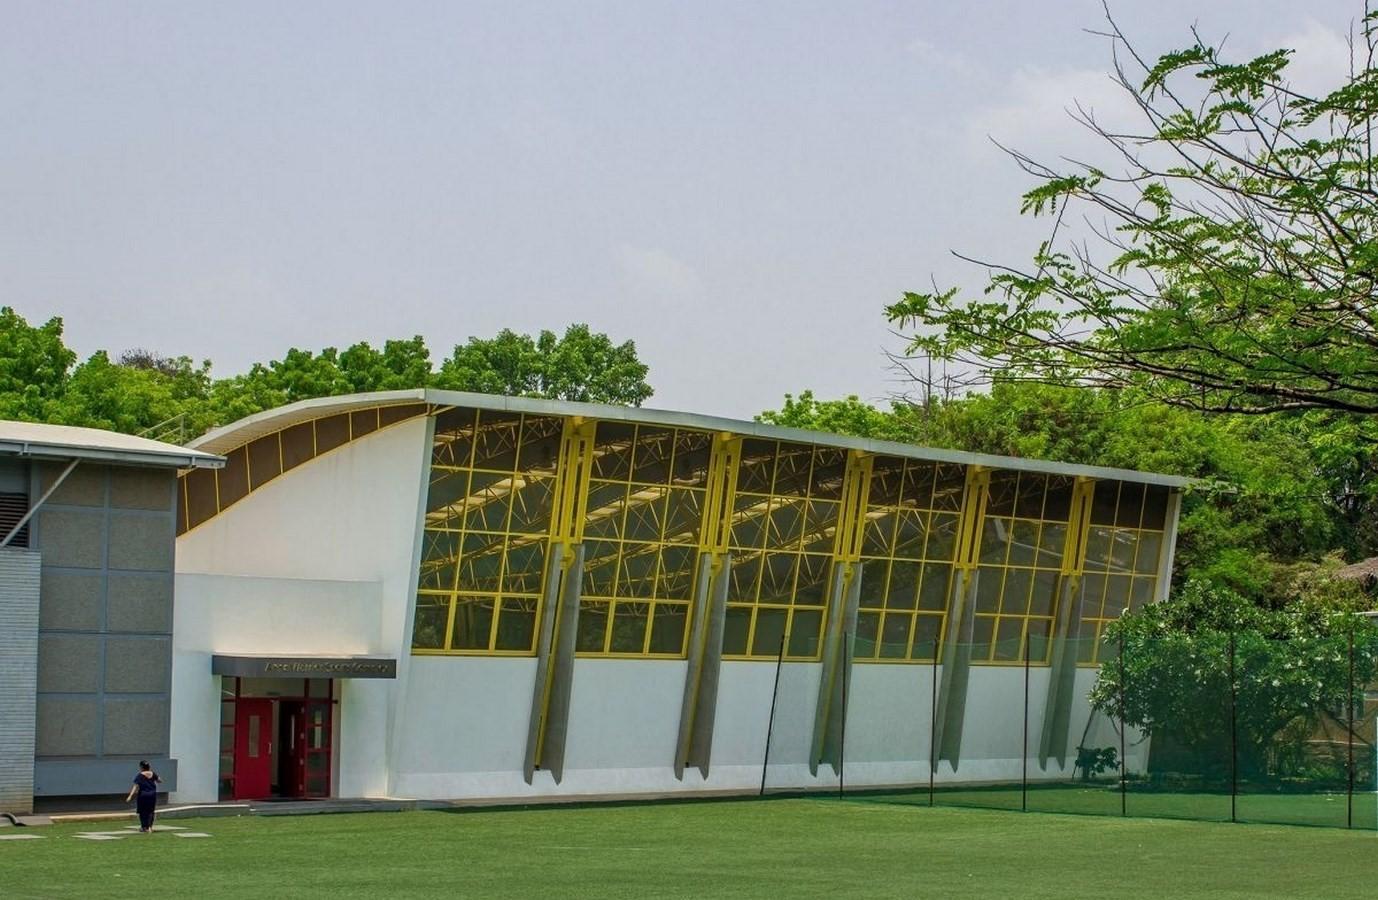 Poolhouse at MallyaAditi International School - Sheet3